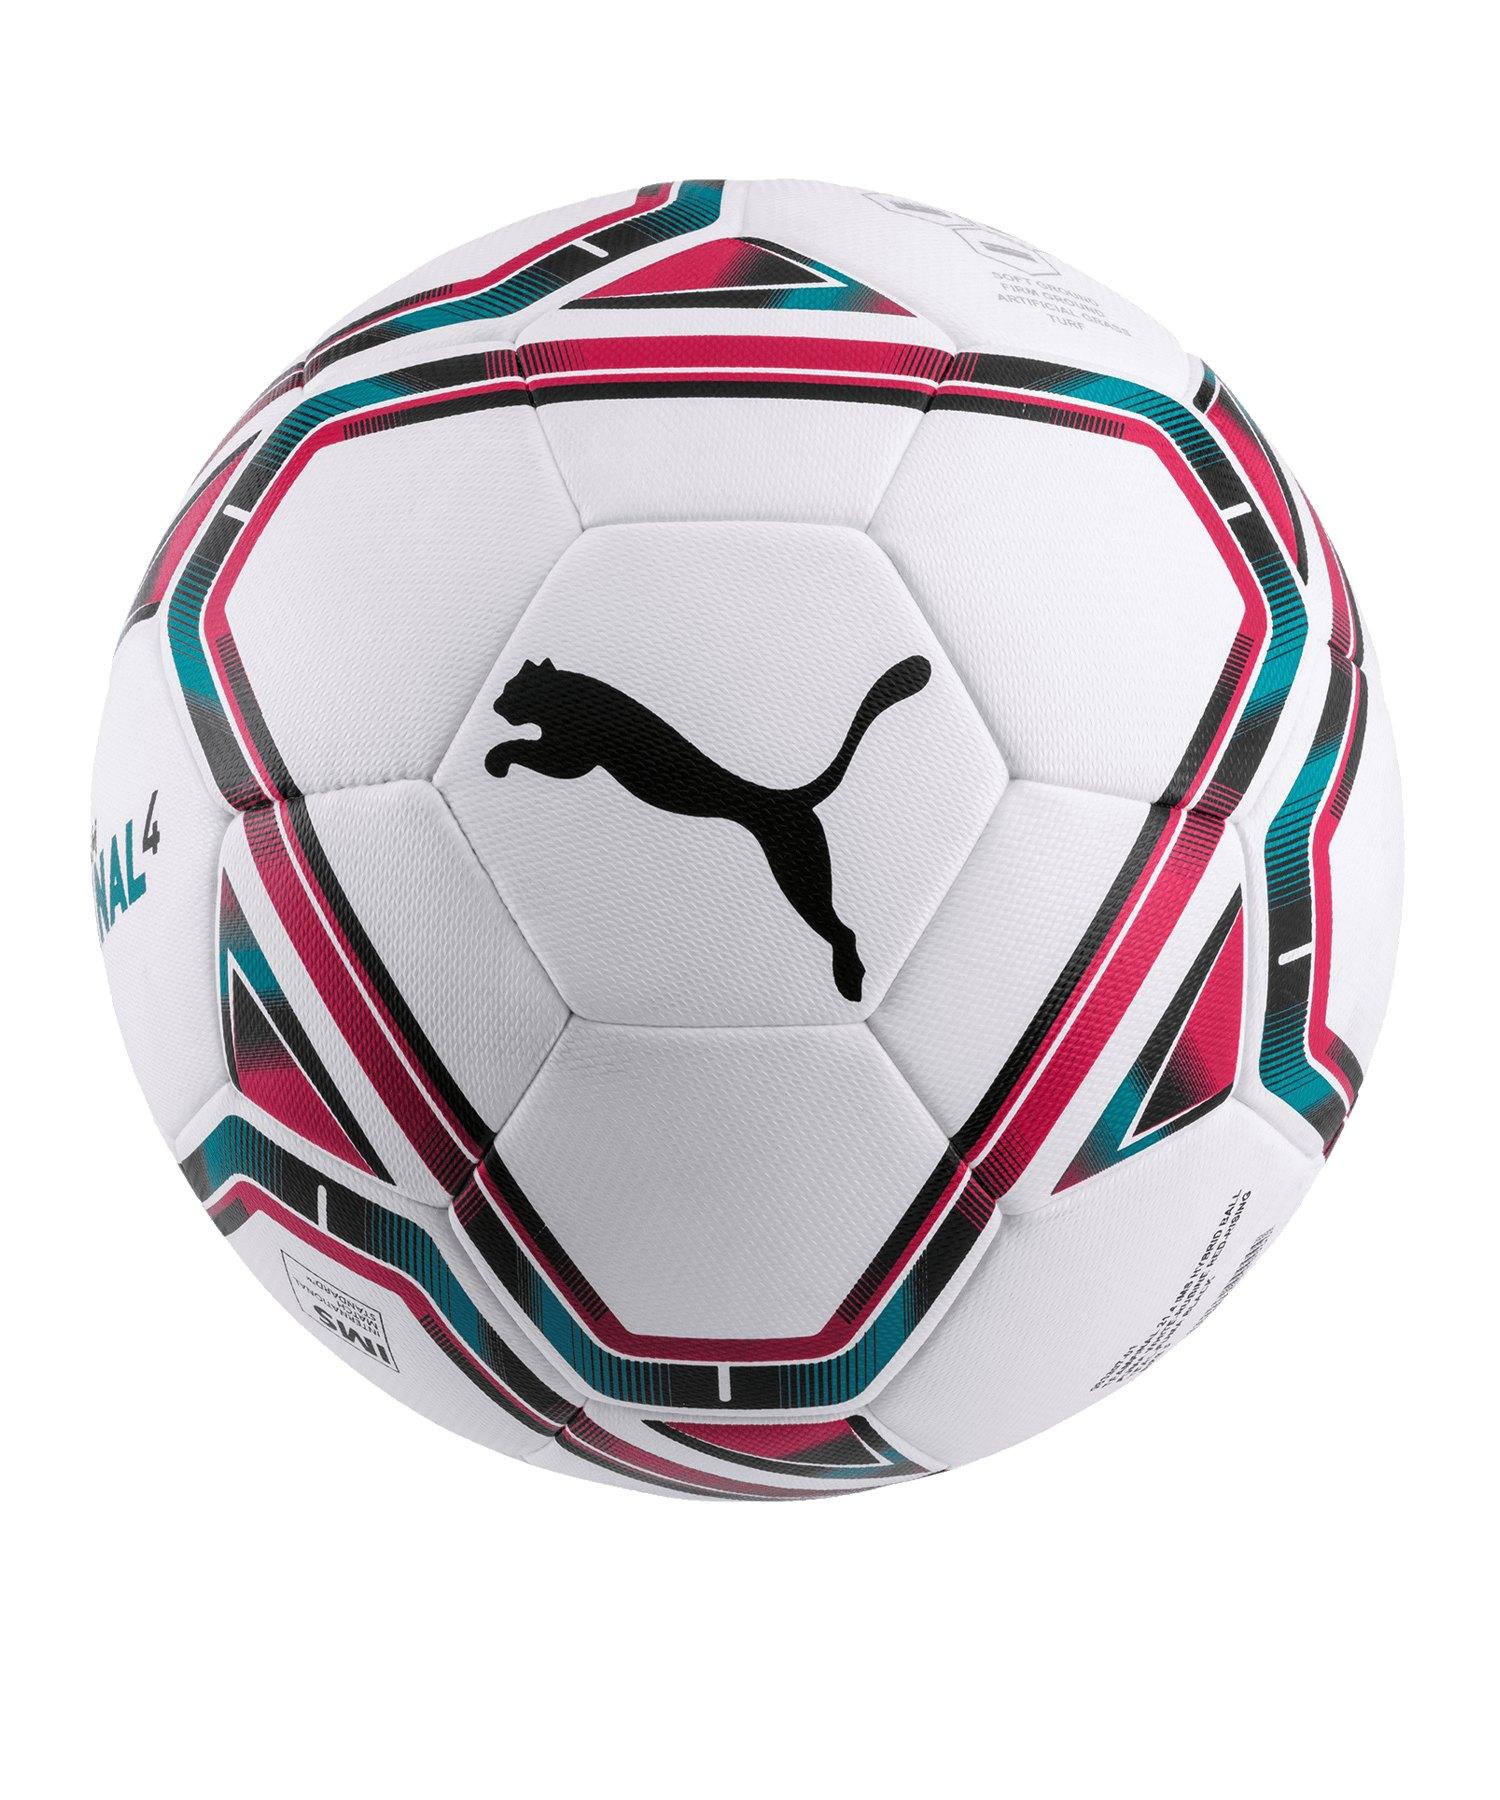 PUMA teamFINAL 21.4. IMS Hybrid Ball Gr. 5 F01 - weiss